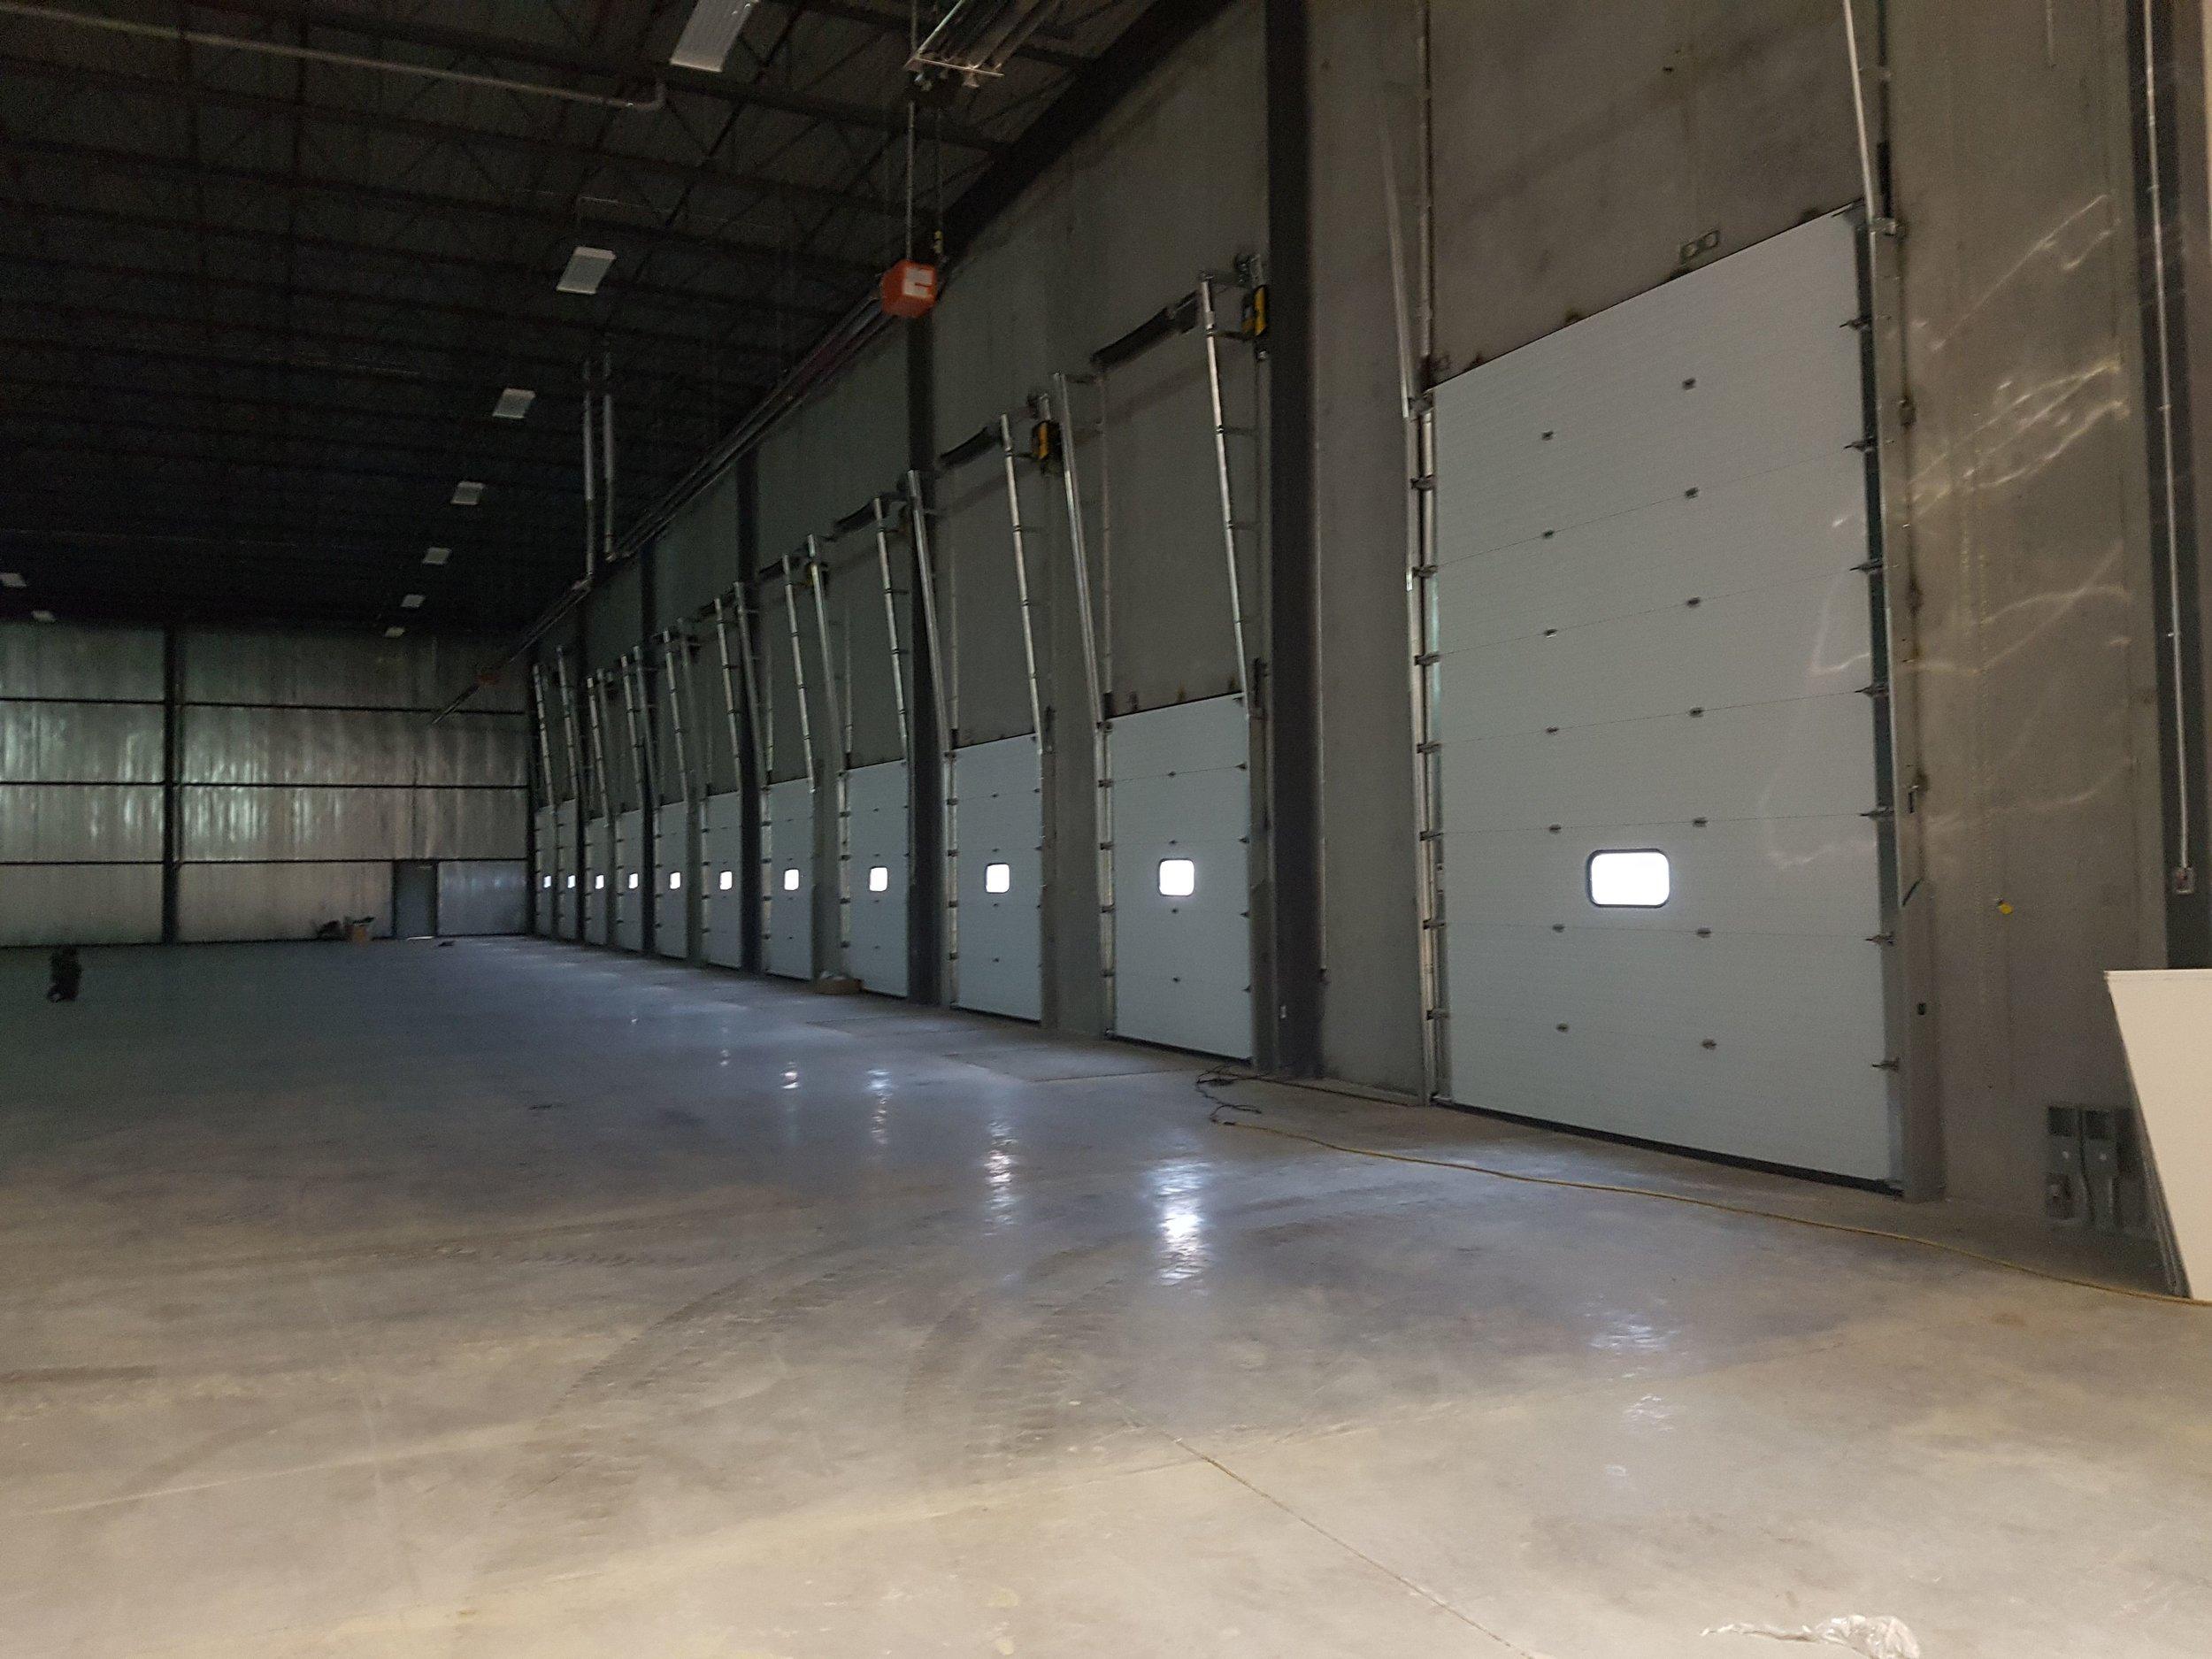 puerta seccional richards wilcox mexico puertaautomatica.mx